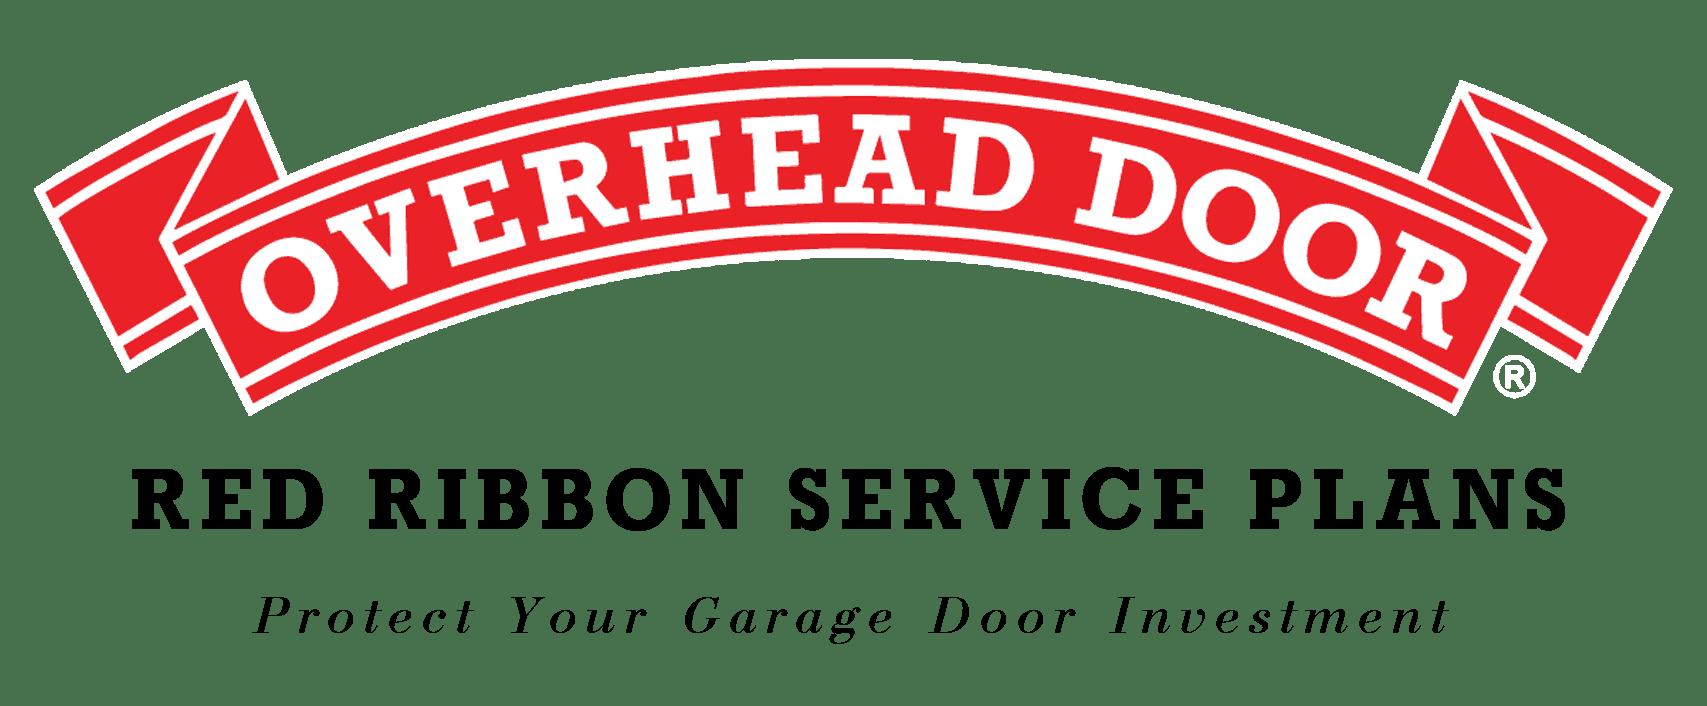 , Red Ribbon Service Plans, Overhead Door Company of Battle Creek & Jackson, Overhead Door Company of Battle Creek & Jackson